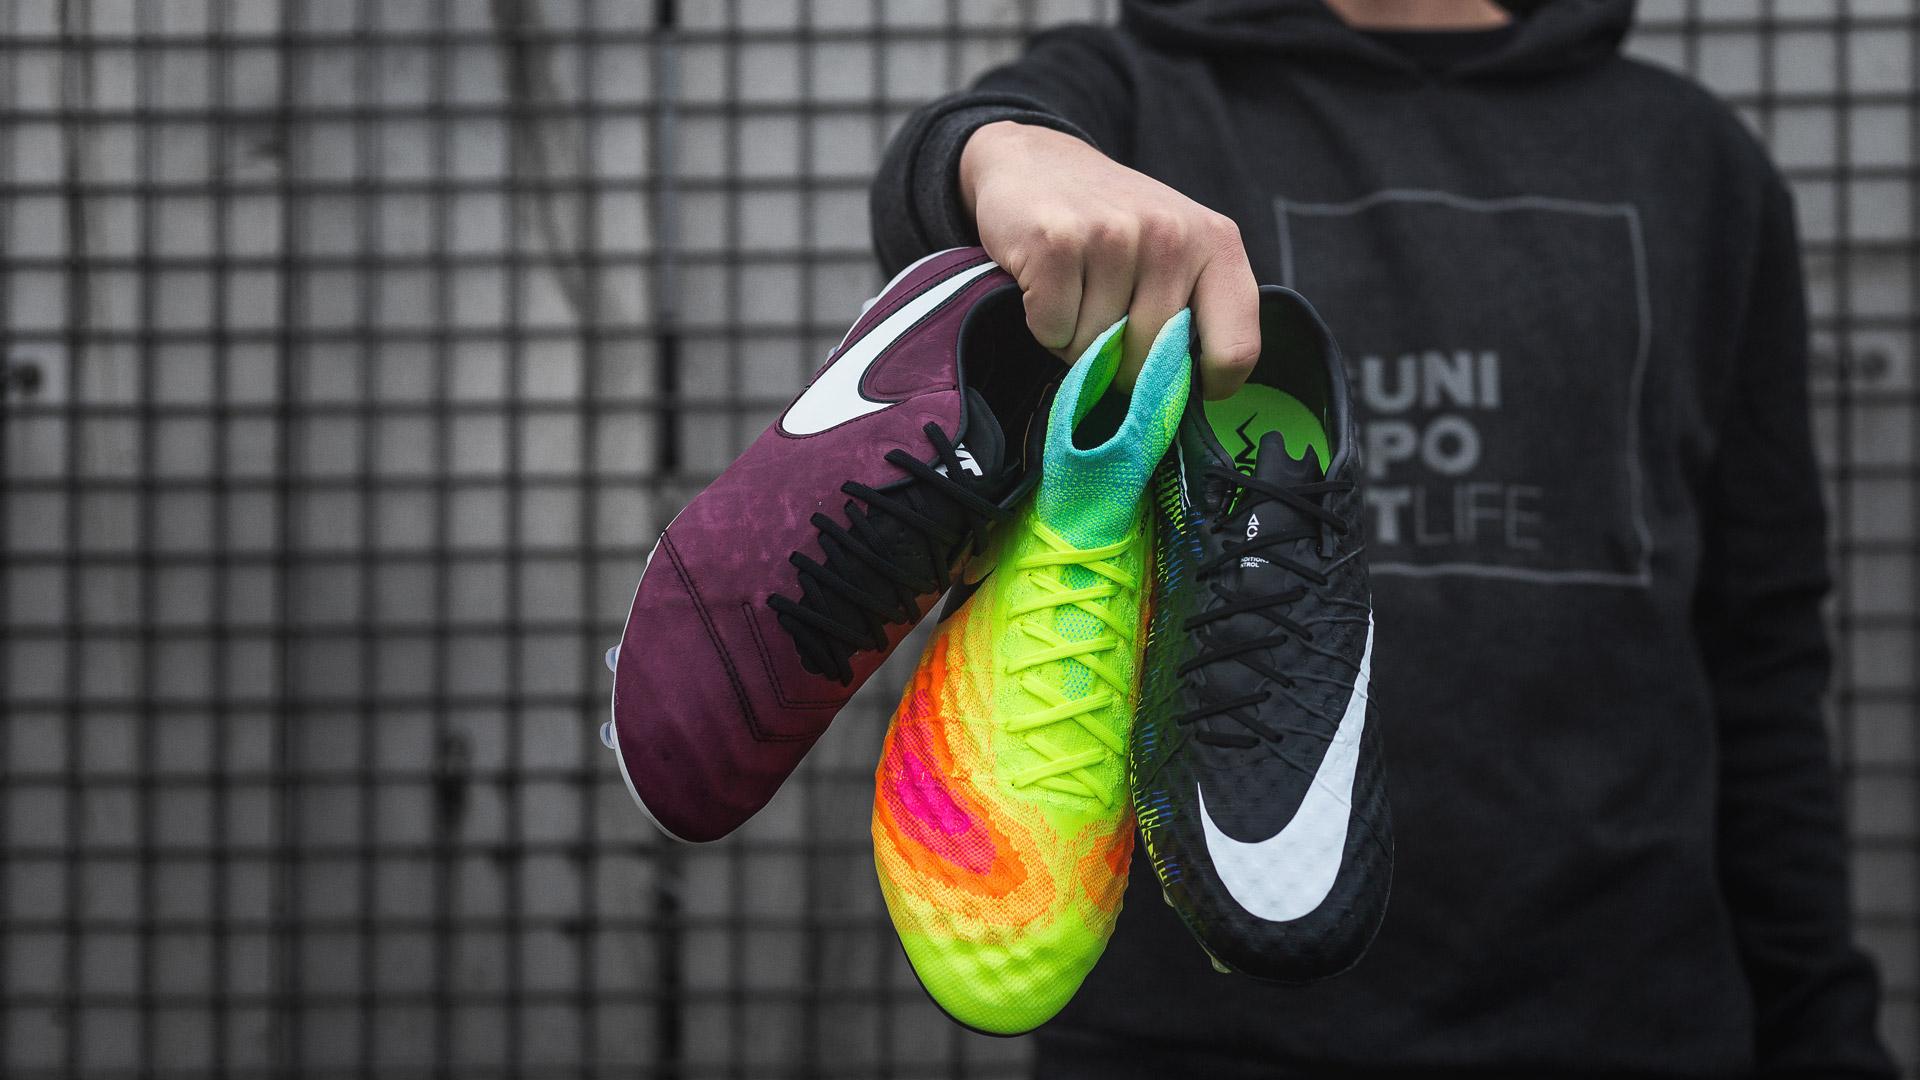 Blaue Nike Free Mercurial Superfly 2016 Schuhe enthüllt